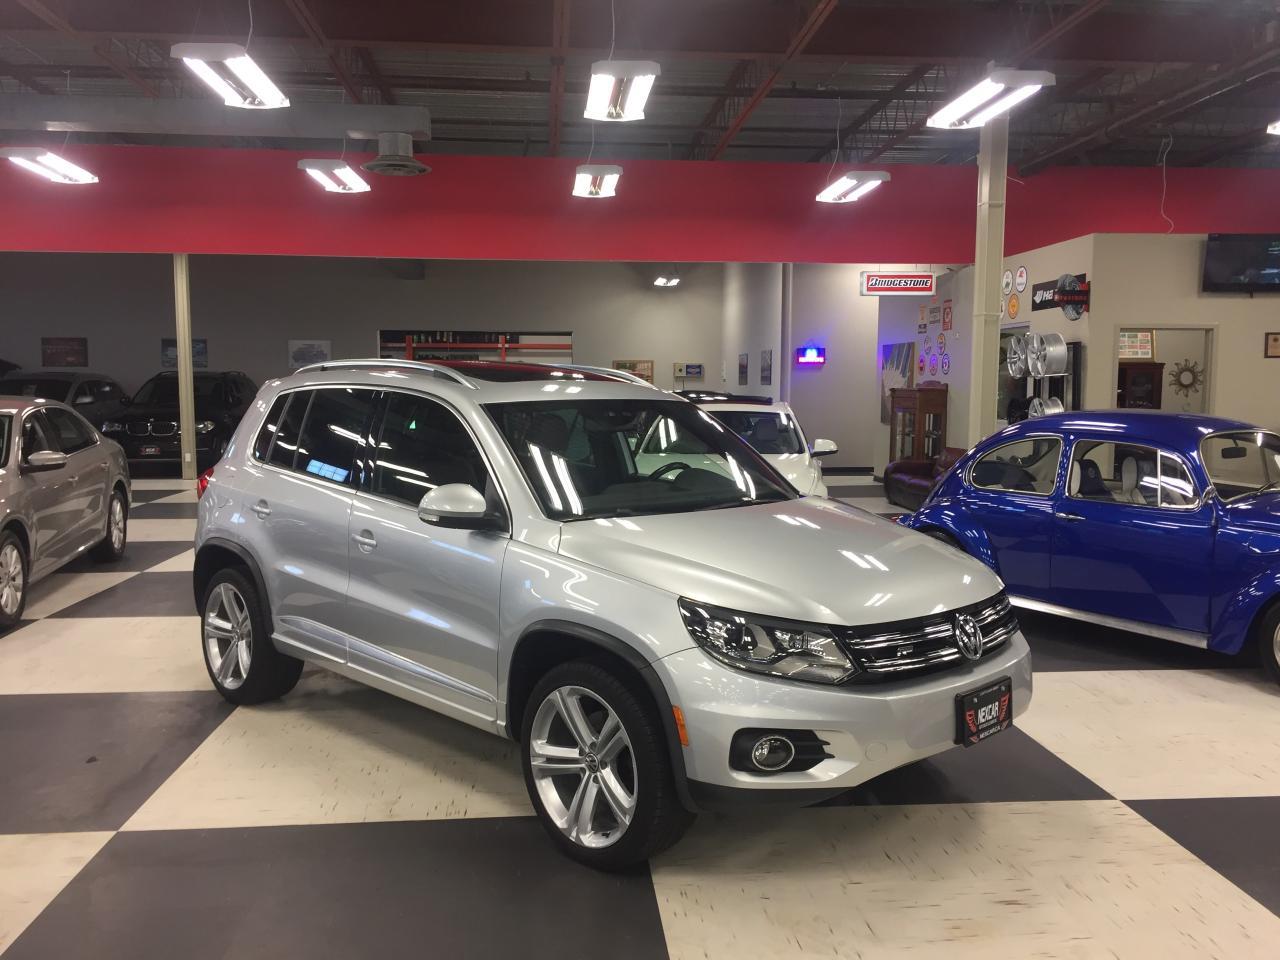 2014 Volkswagen Tiguan 2.0TSI HIGHLINE AWD AUT0 NAVI LEATHER PANO/ROOF